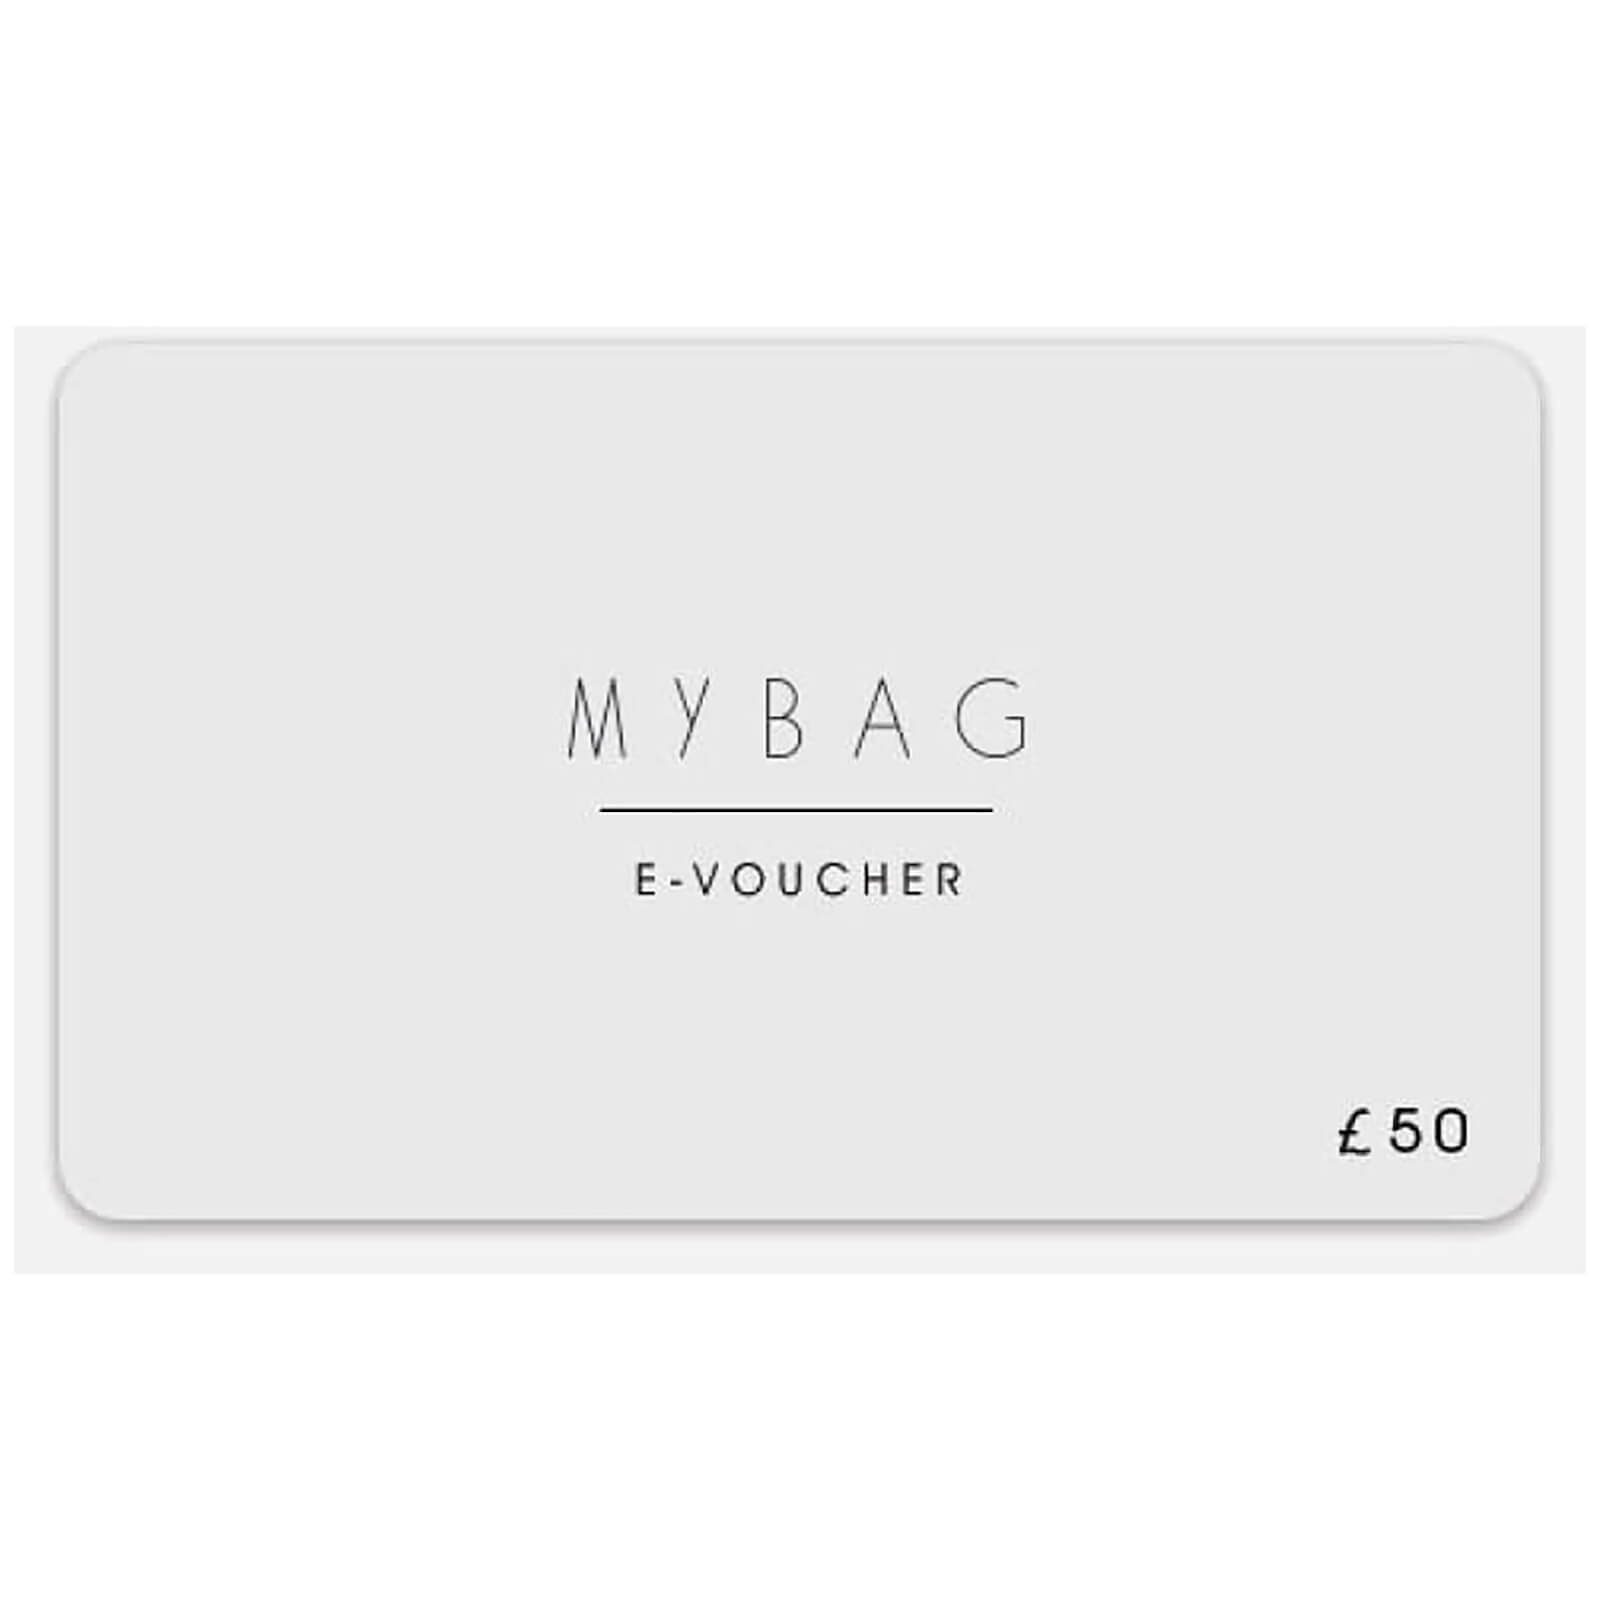 £50 MyBag Gift Voucher